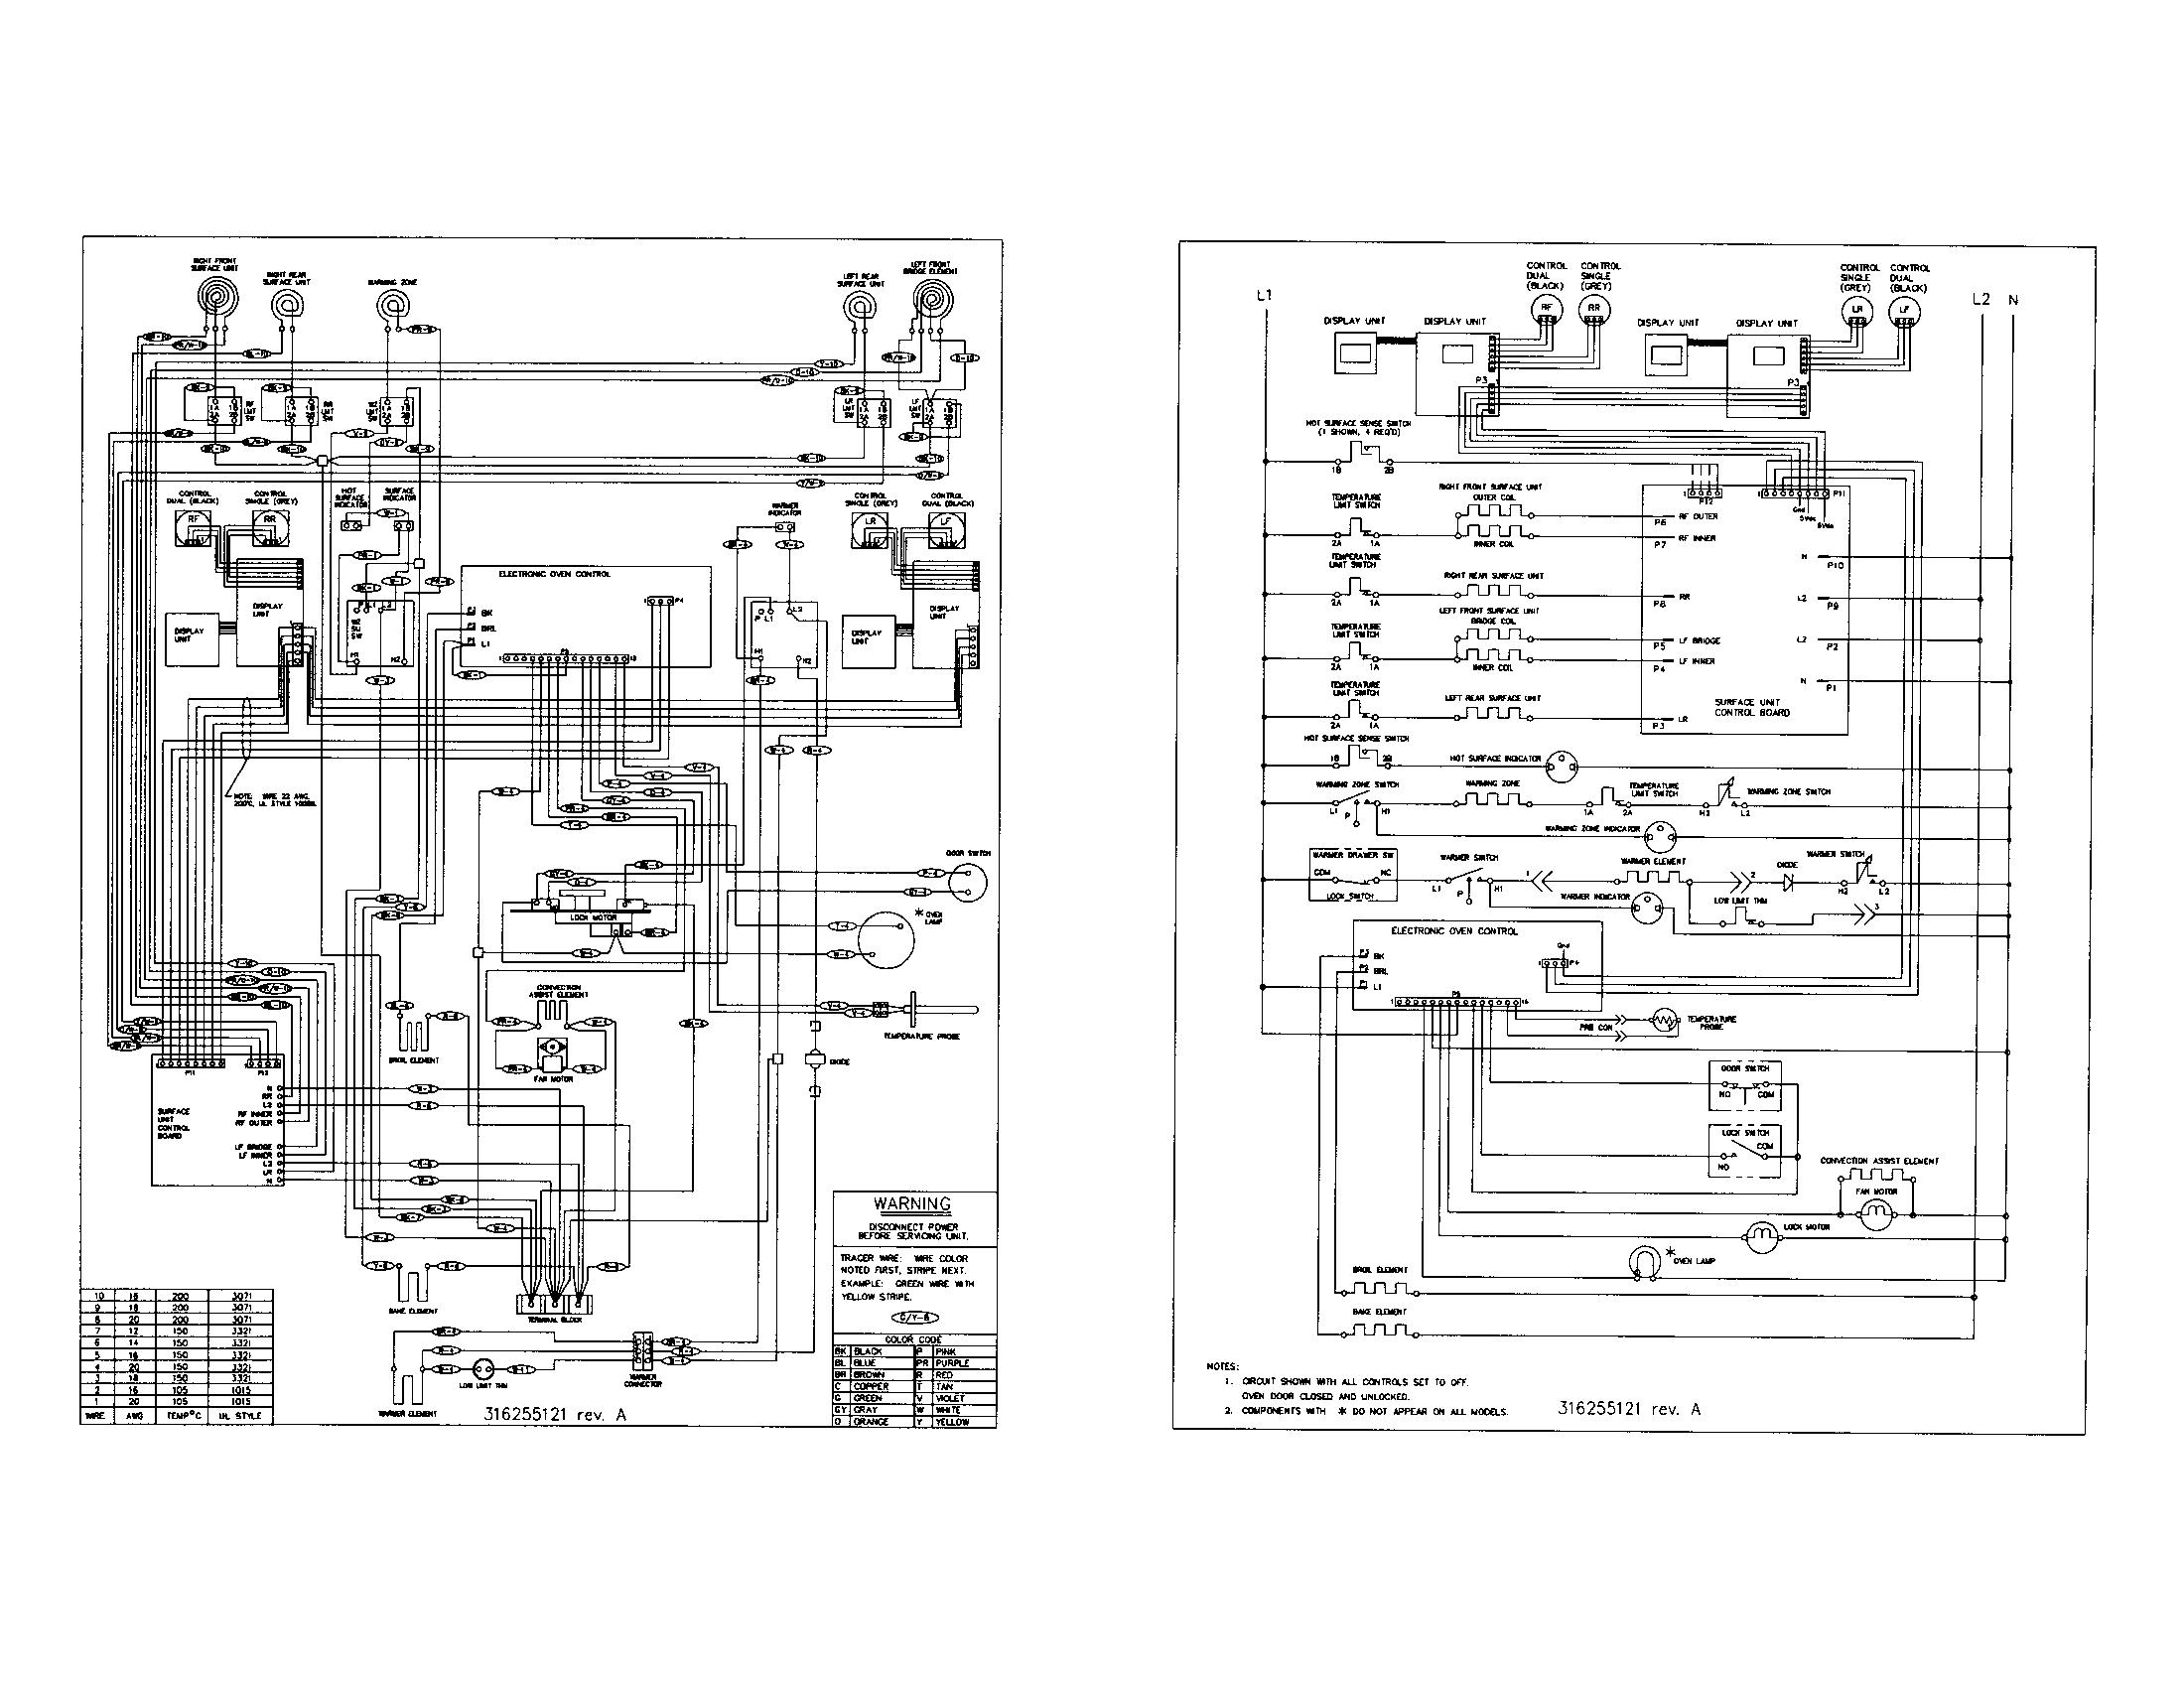 wiring diagram parts?resize\=665%2C513\&ssl\=1 kitchenaid wiring diagram kitchenaid washing machine diagram kitchenaid dryer wiring diagram at gsmx.co